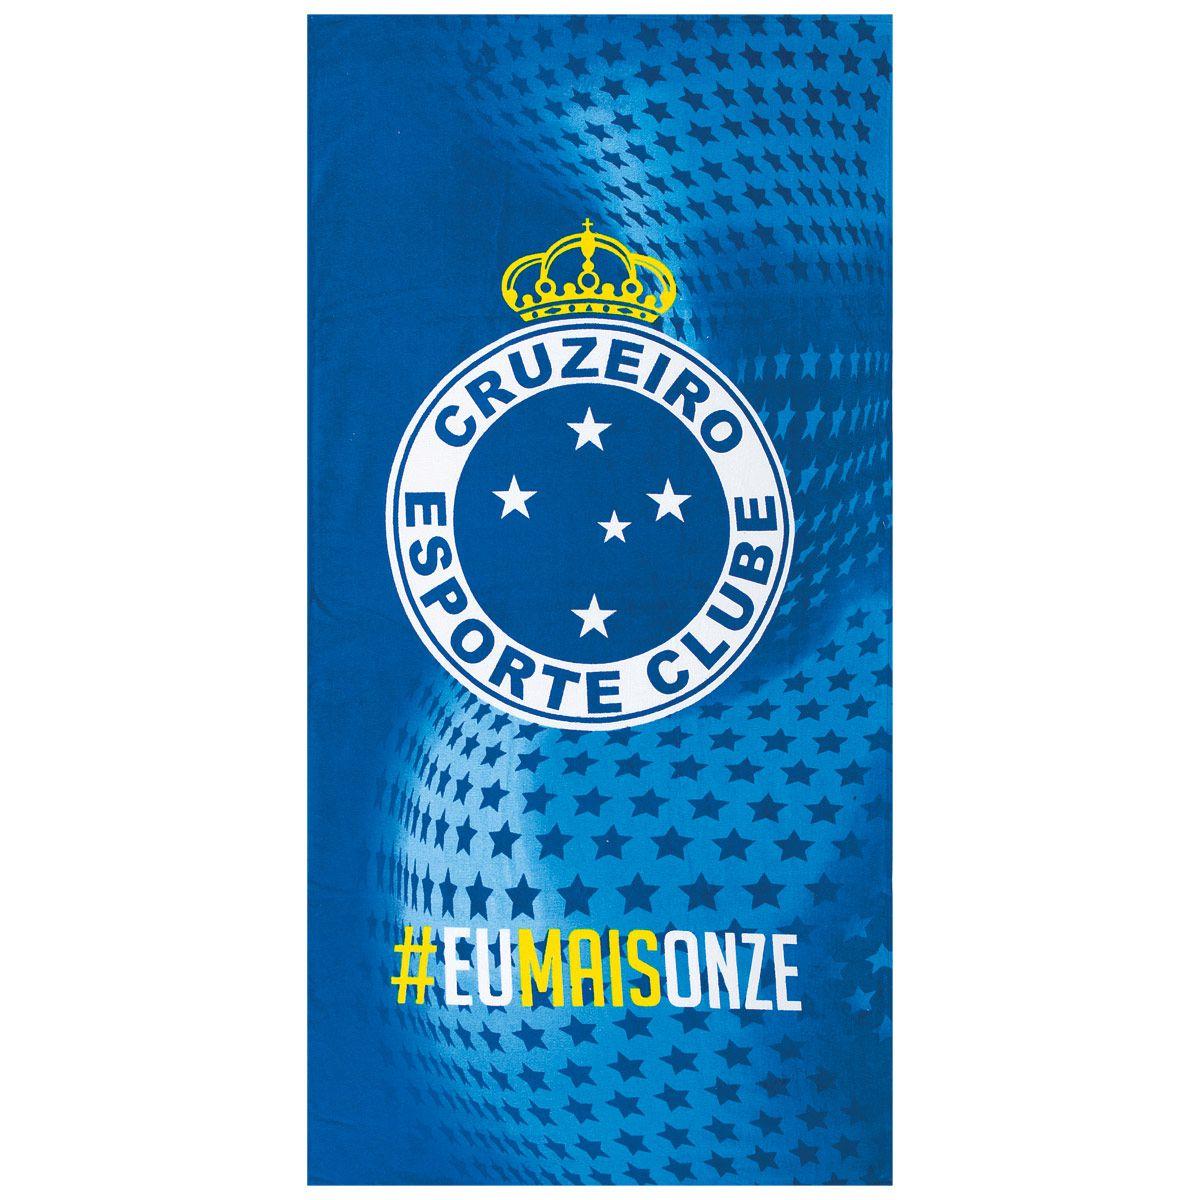 b2d41ba76 Toalha do Cruzeiro Velour Dohler 19078 - FUTEBOL SHOP